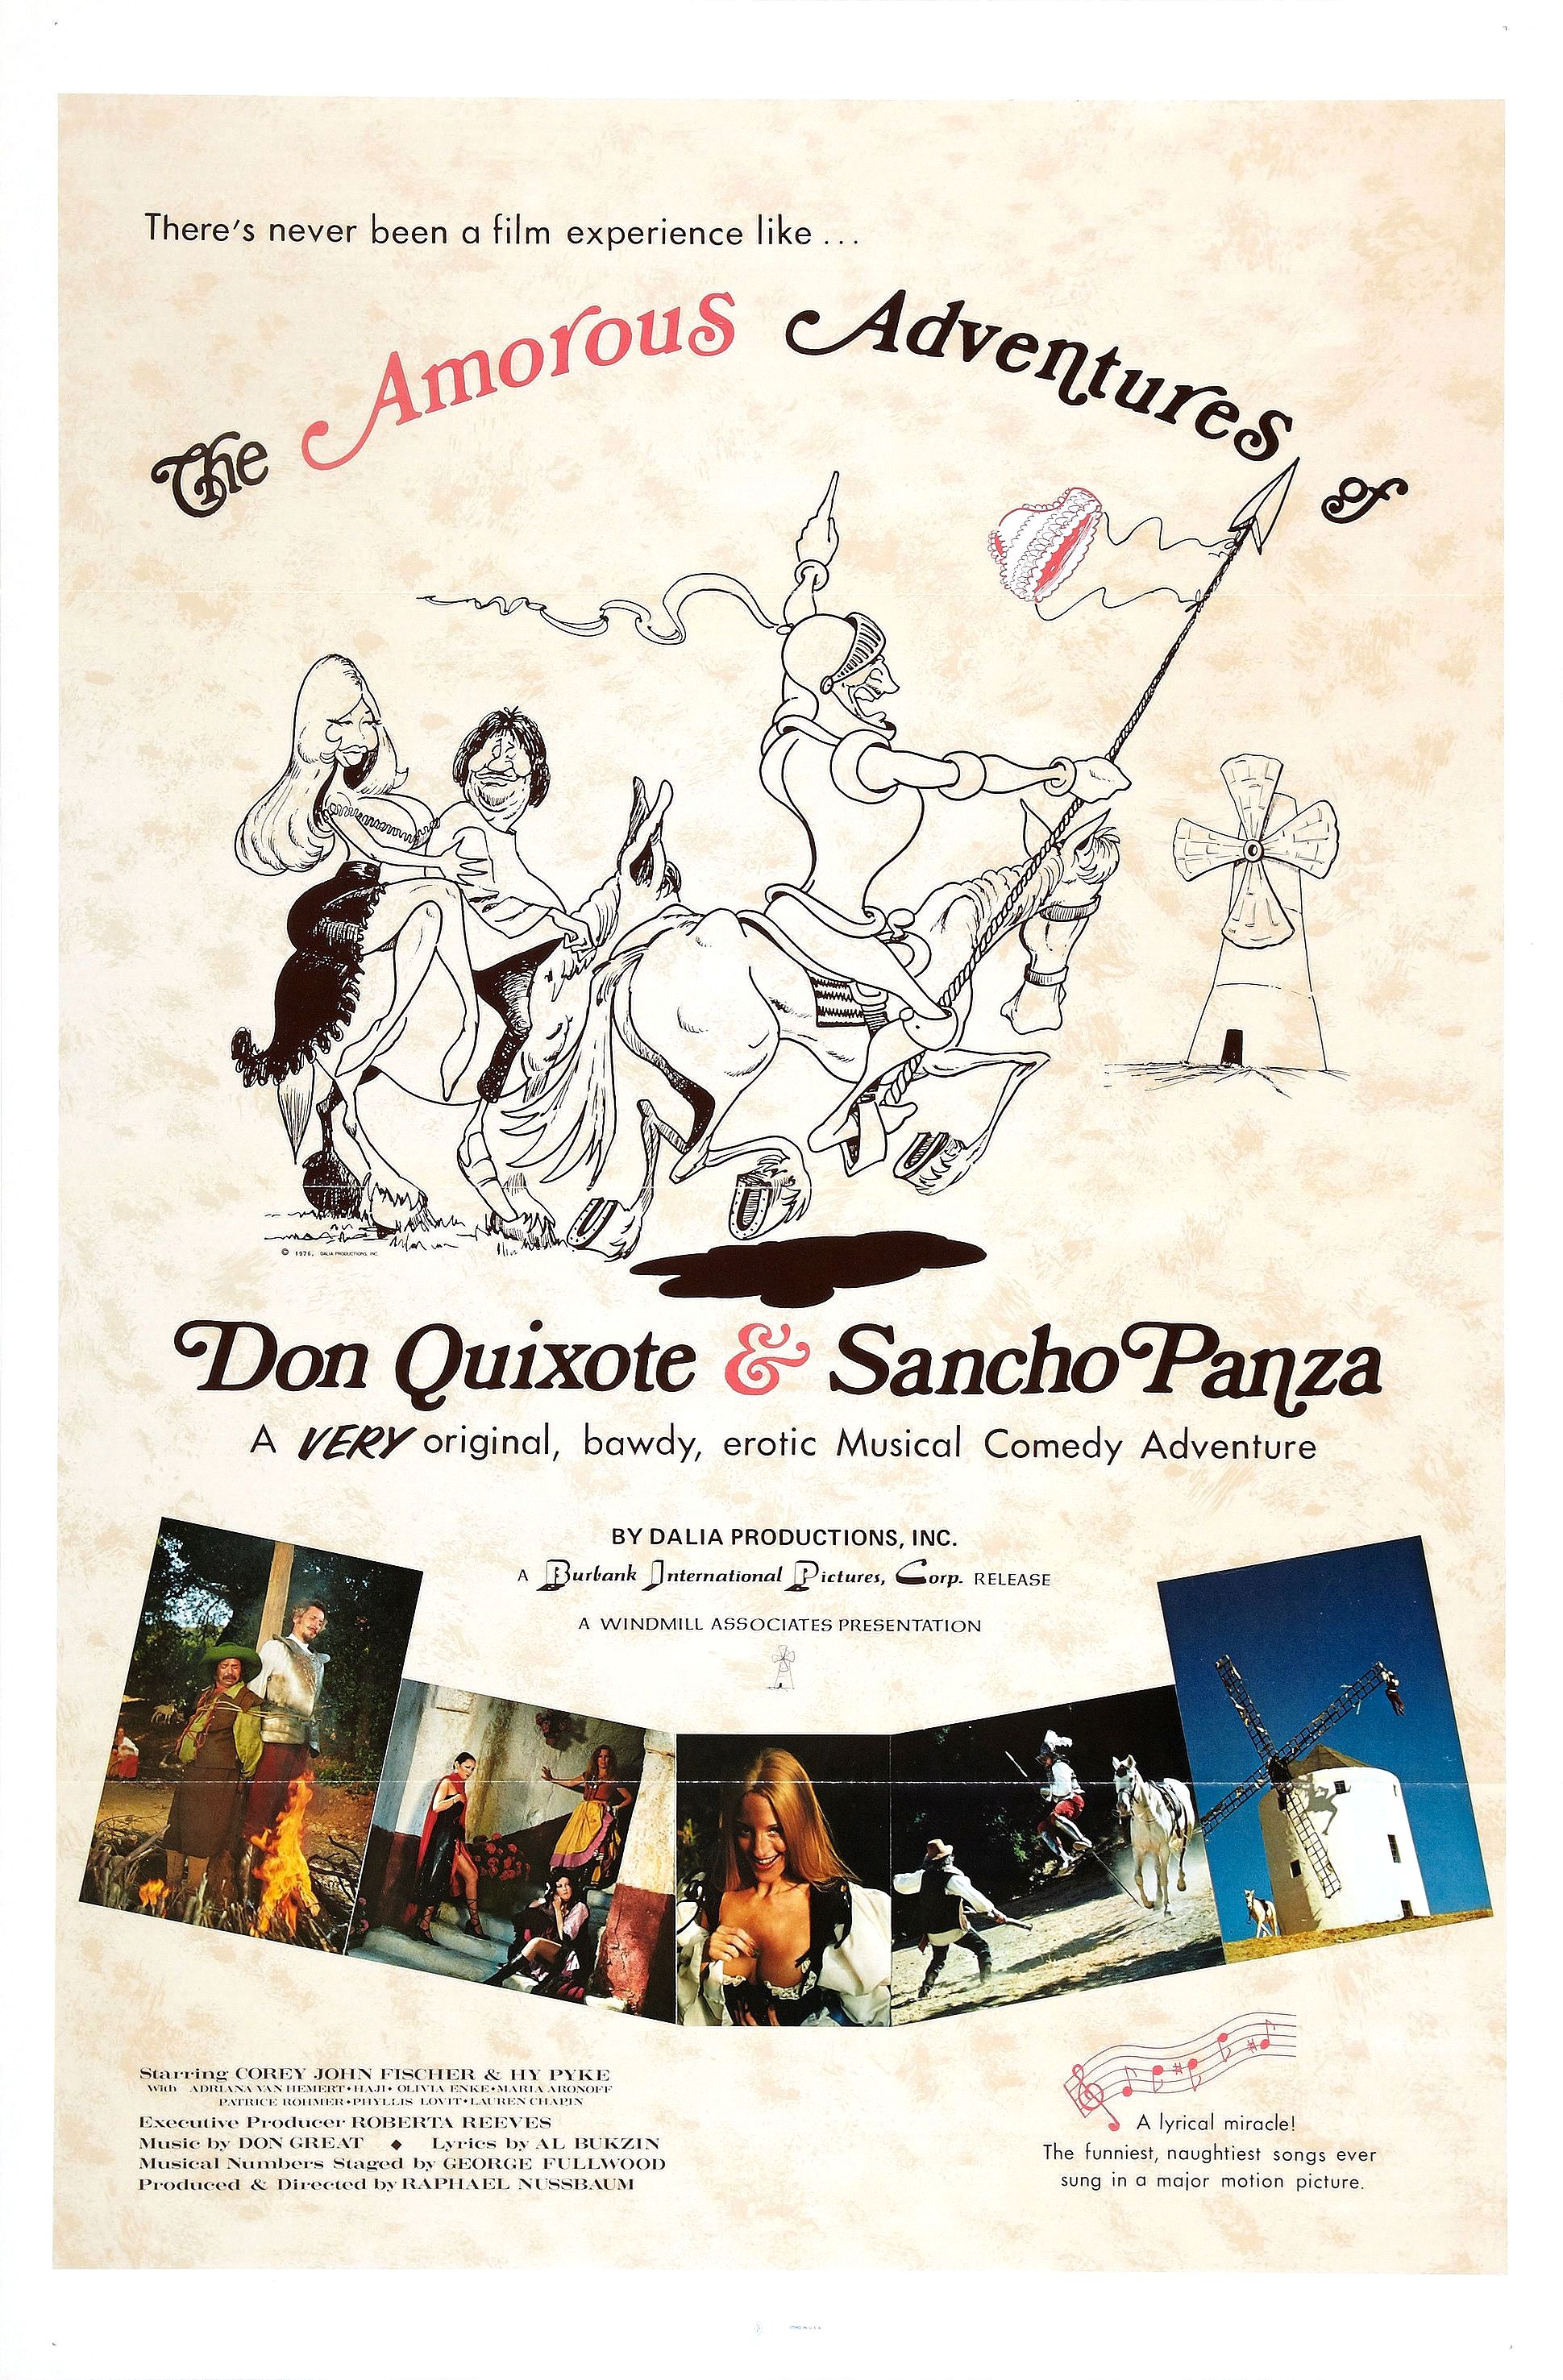 The Amorous Adventures Of Don Quixote And Sancho Panza 1976 Imdb